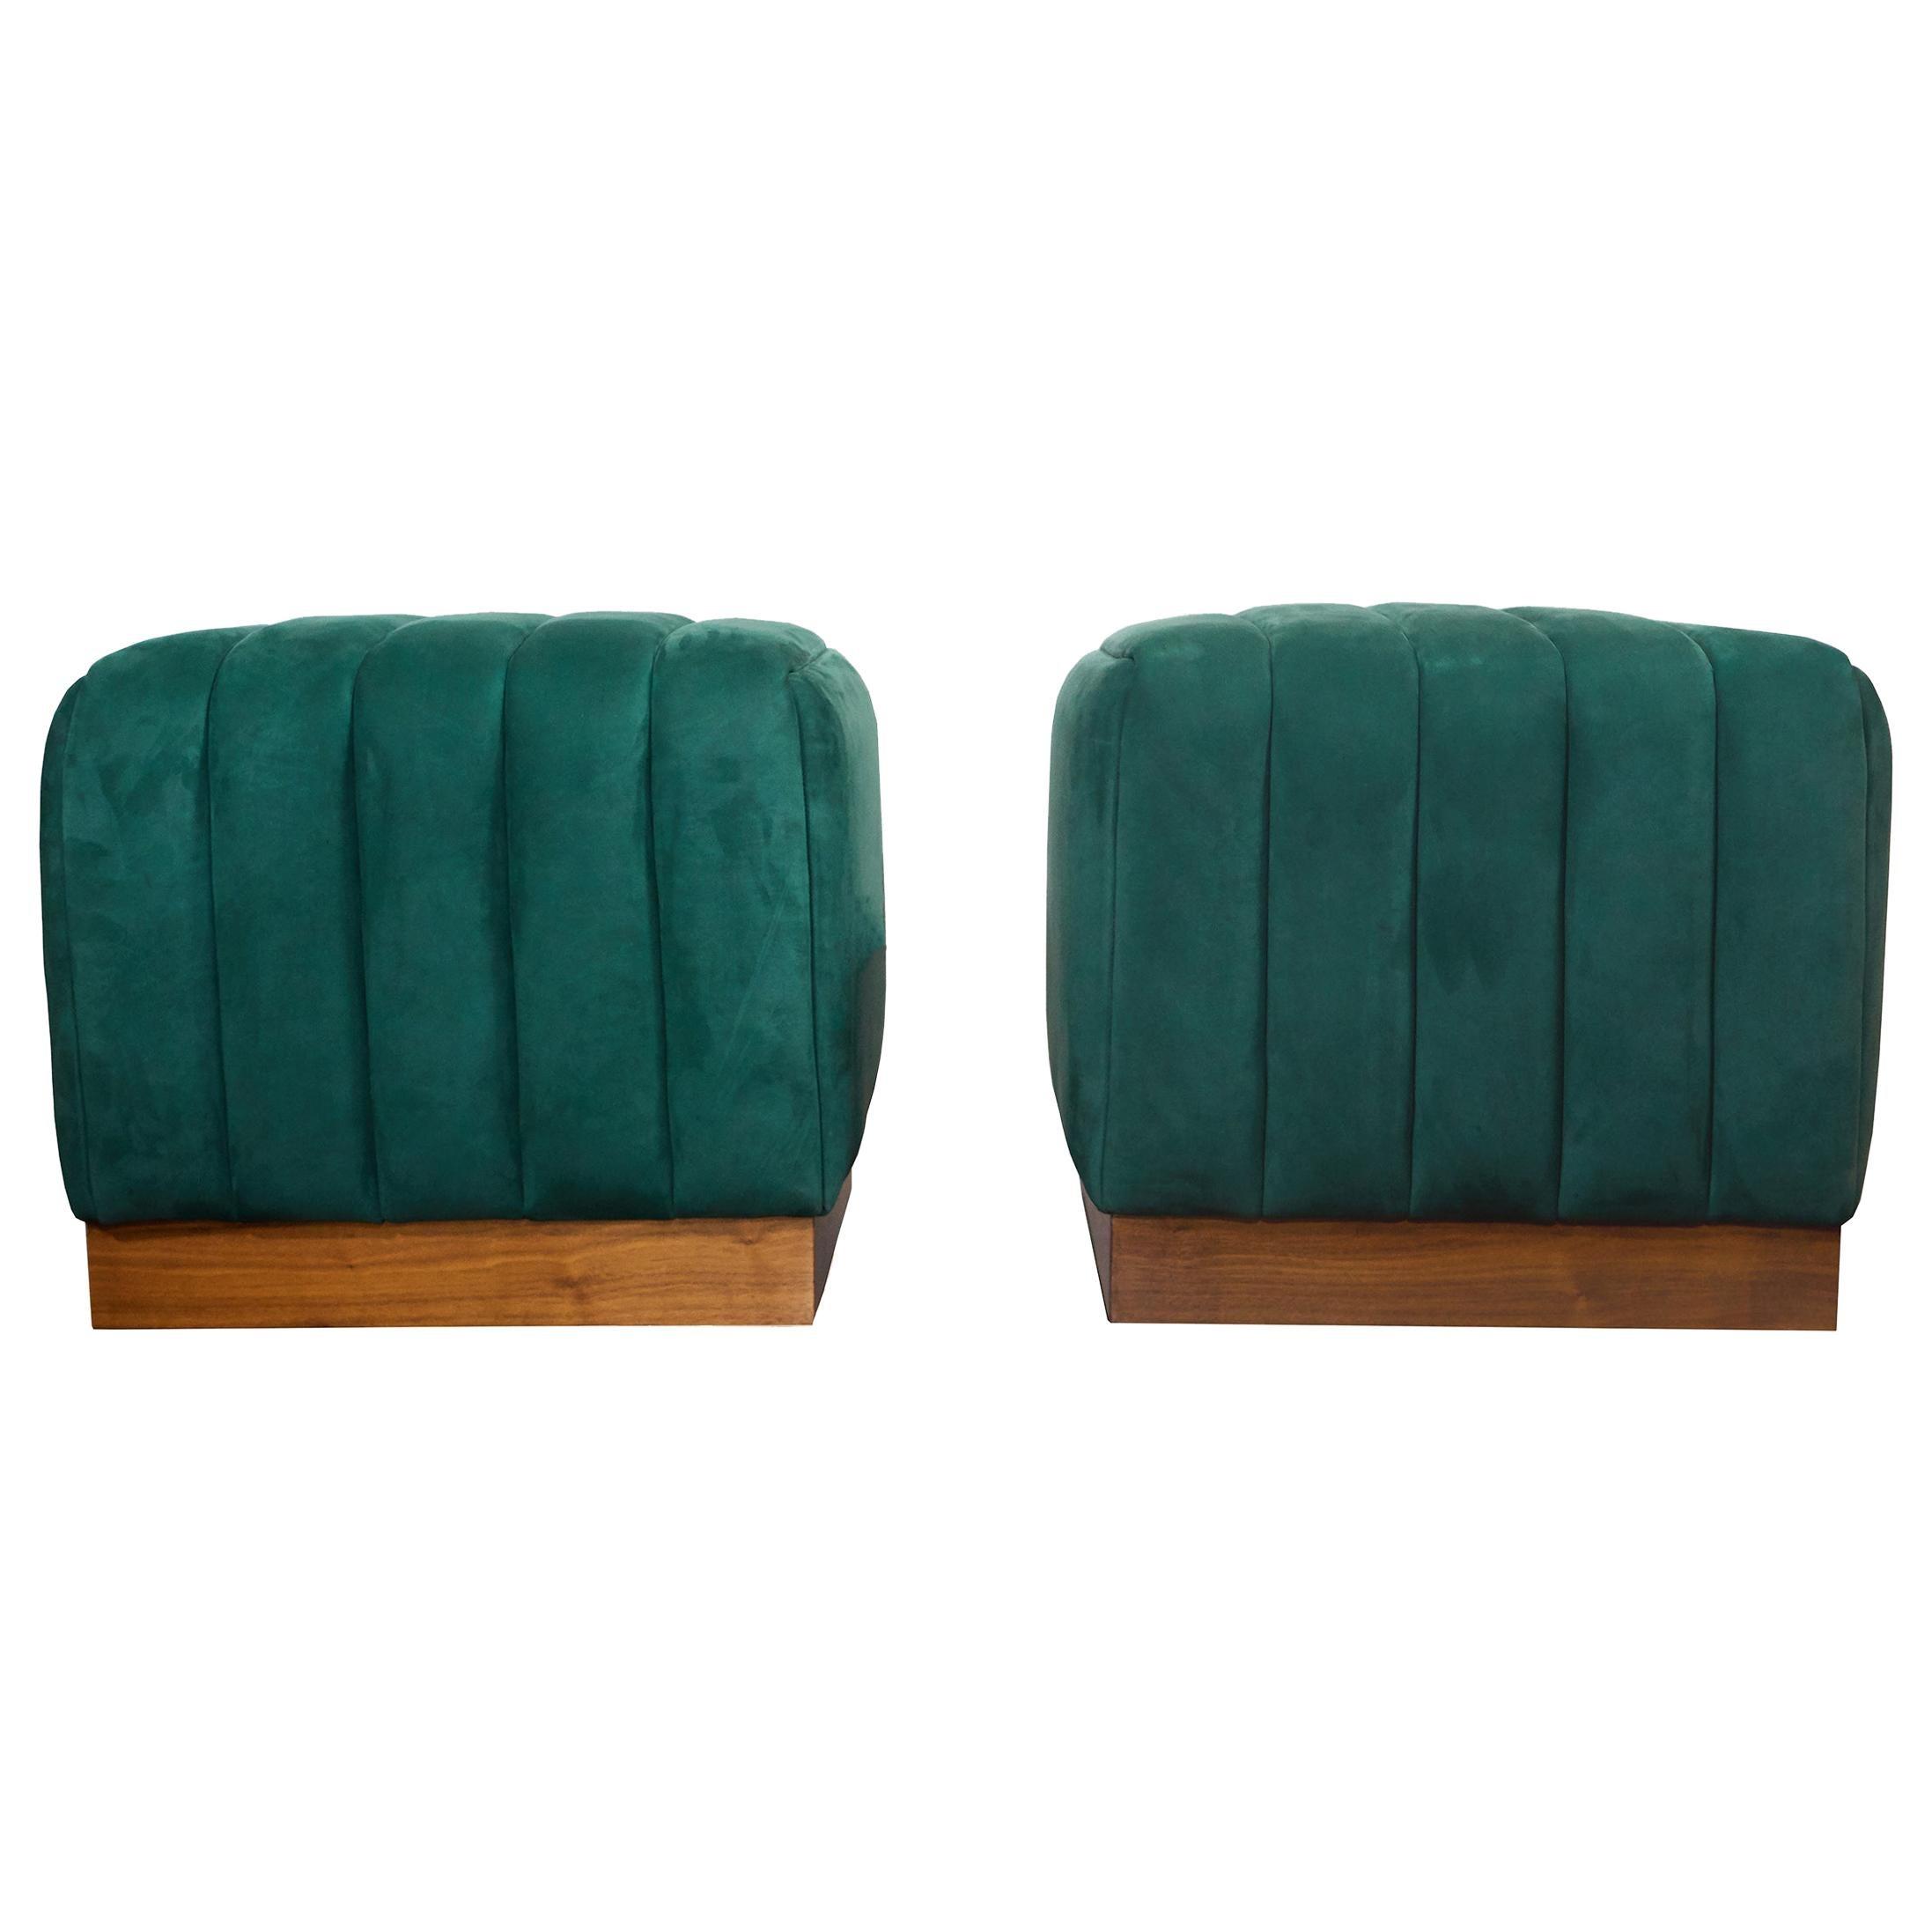 Modern Channel Detailed Nubuck Leather Upholstered Ottomans W/ Walnut Base S/Pr